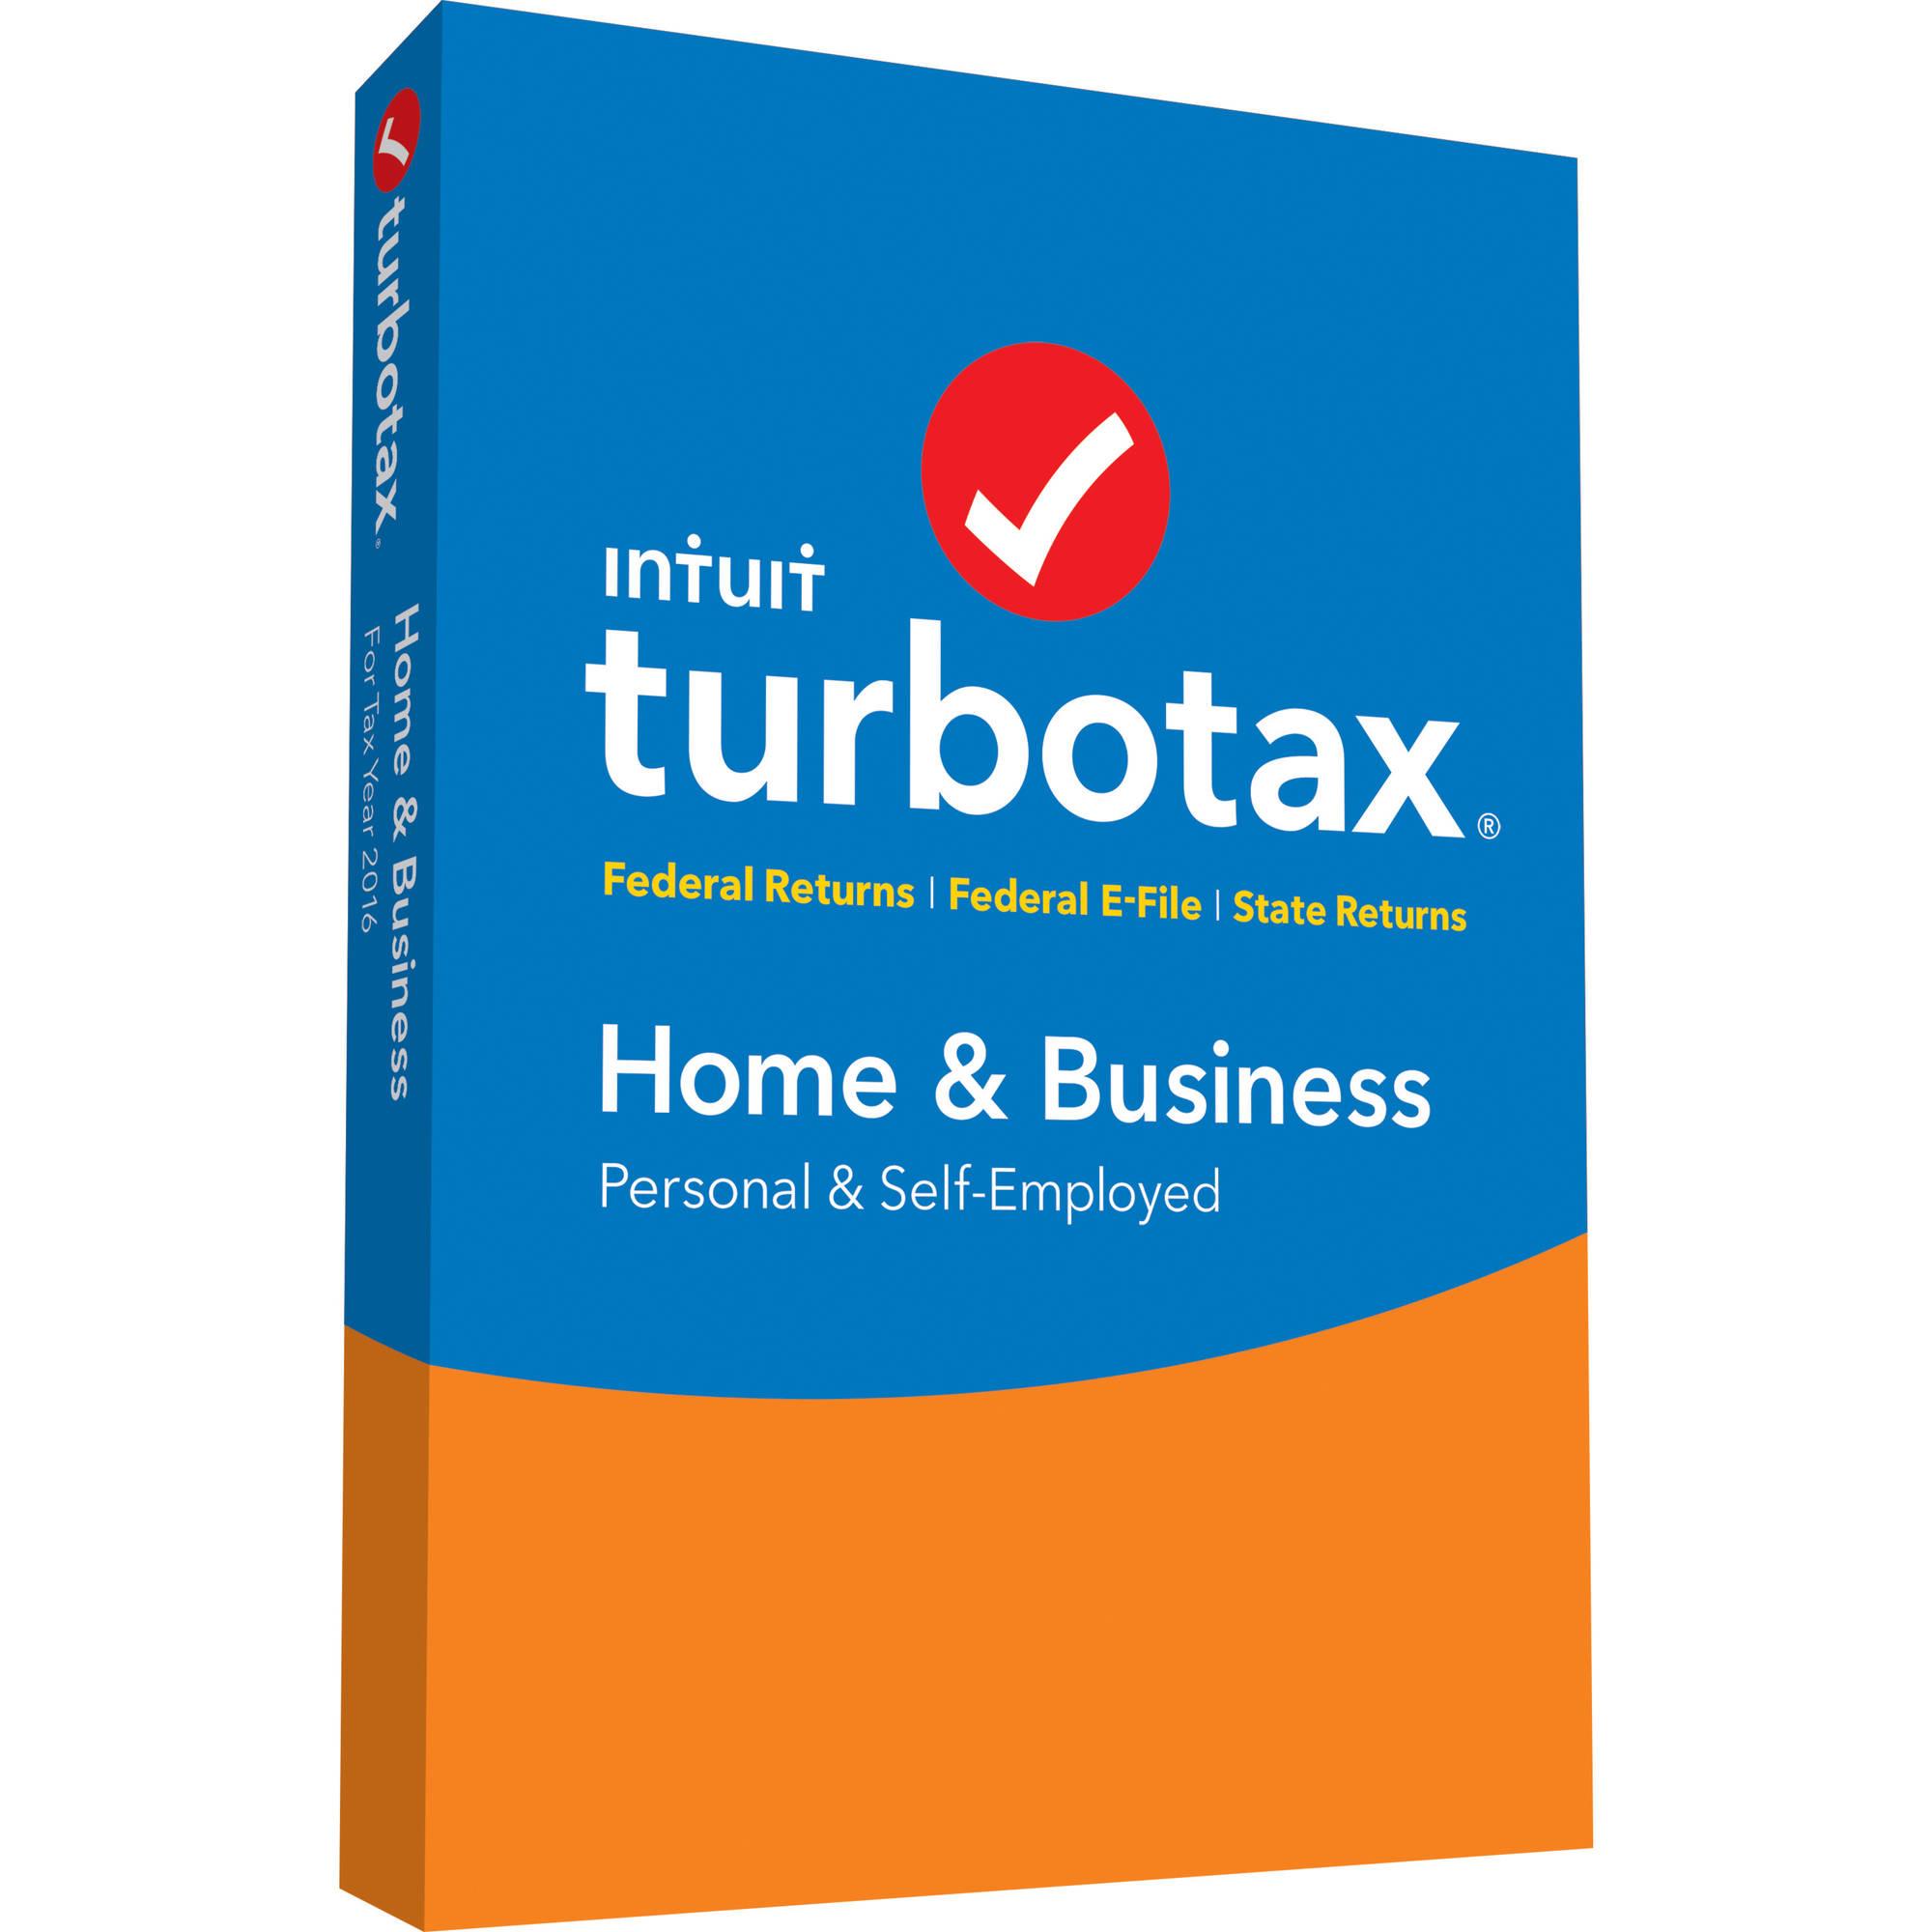 Turbotax Home & Business 2016 $53.35 (PC/Mac Disc) @ Walmart.com